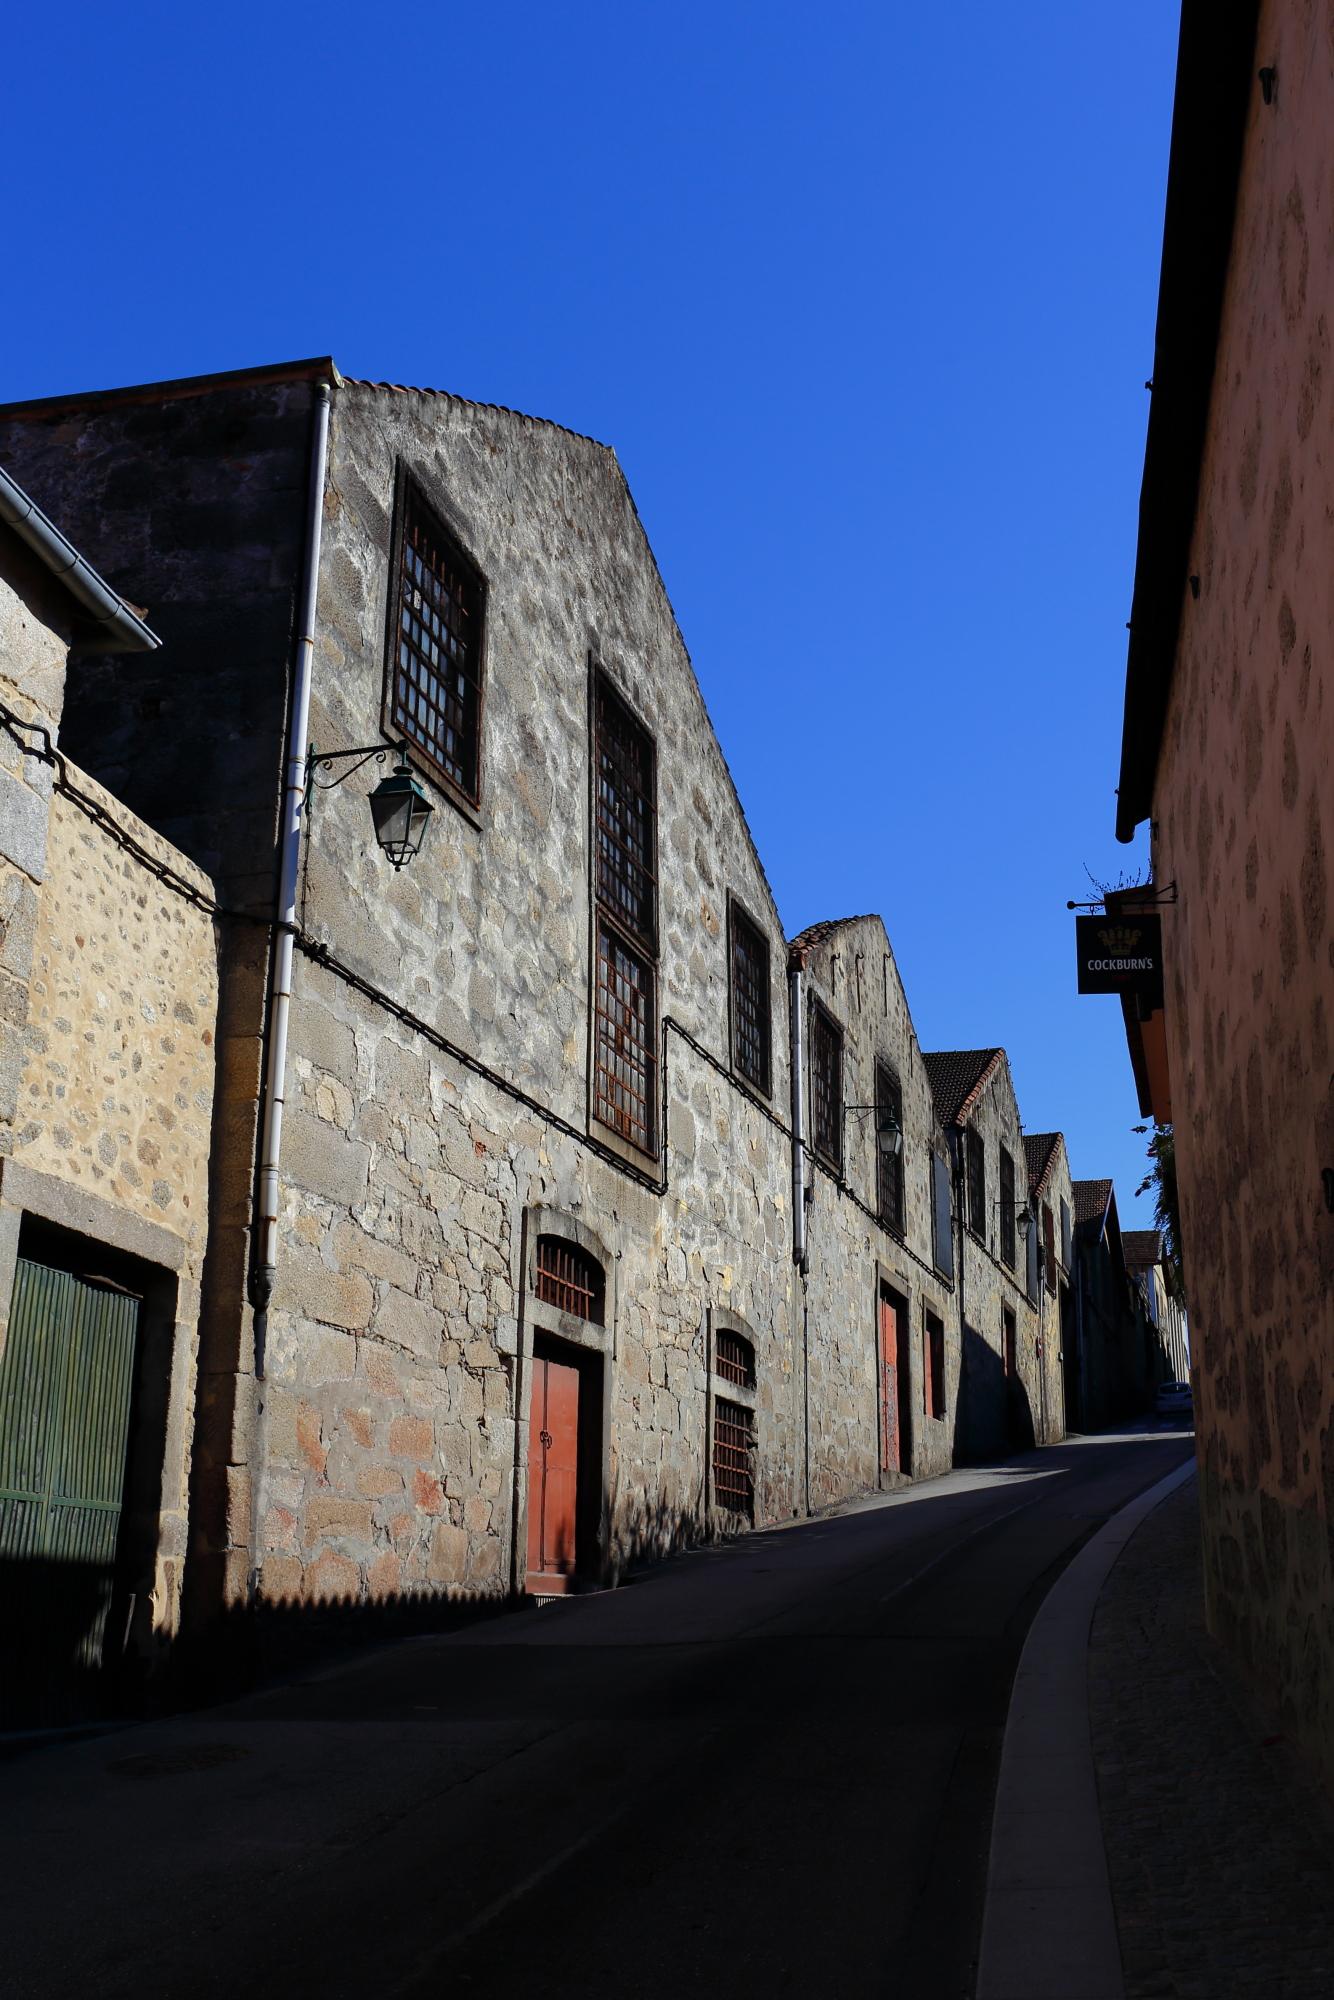 Cockburn's Port Lodge